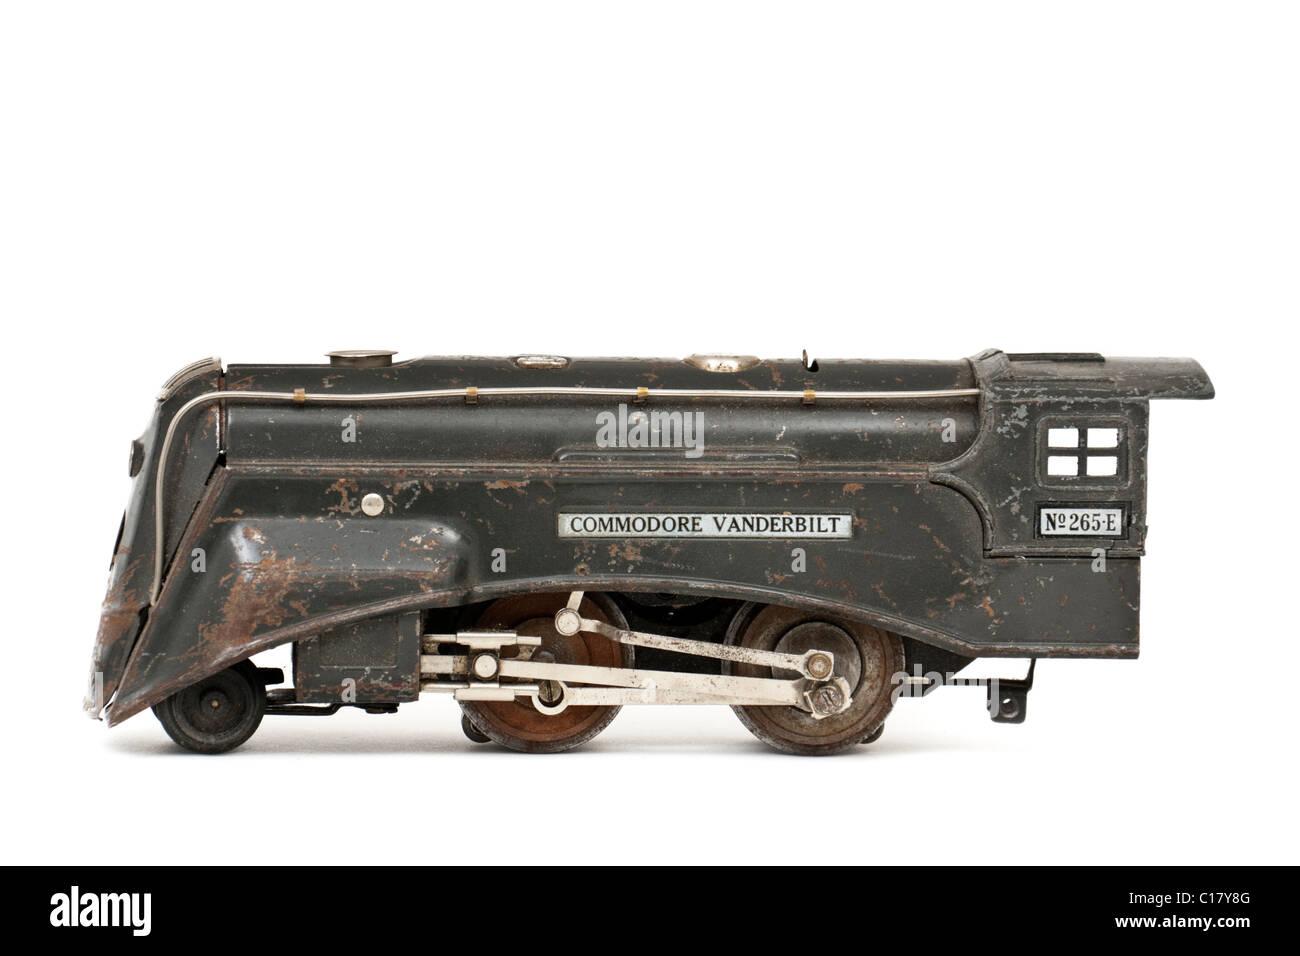 1935 Lionel 'Commodore Vanderbilt No 265-E' model railway locomotive (O-gauge, 3-rail) - Stock Image